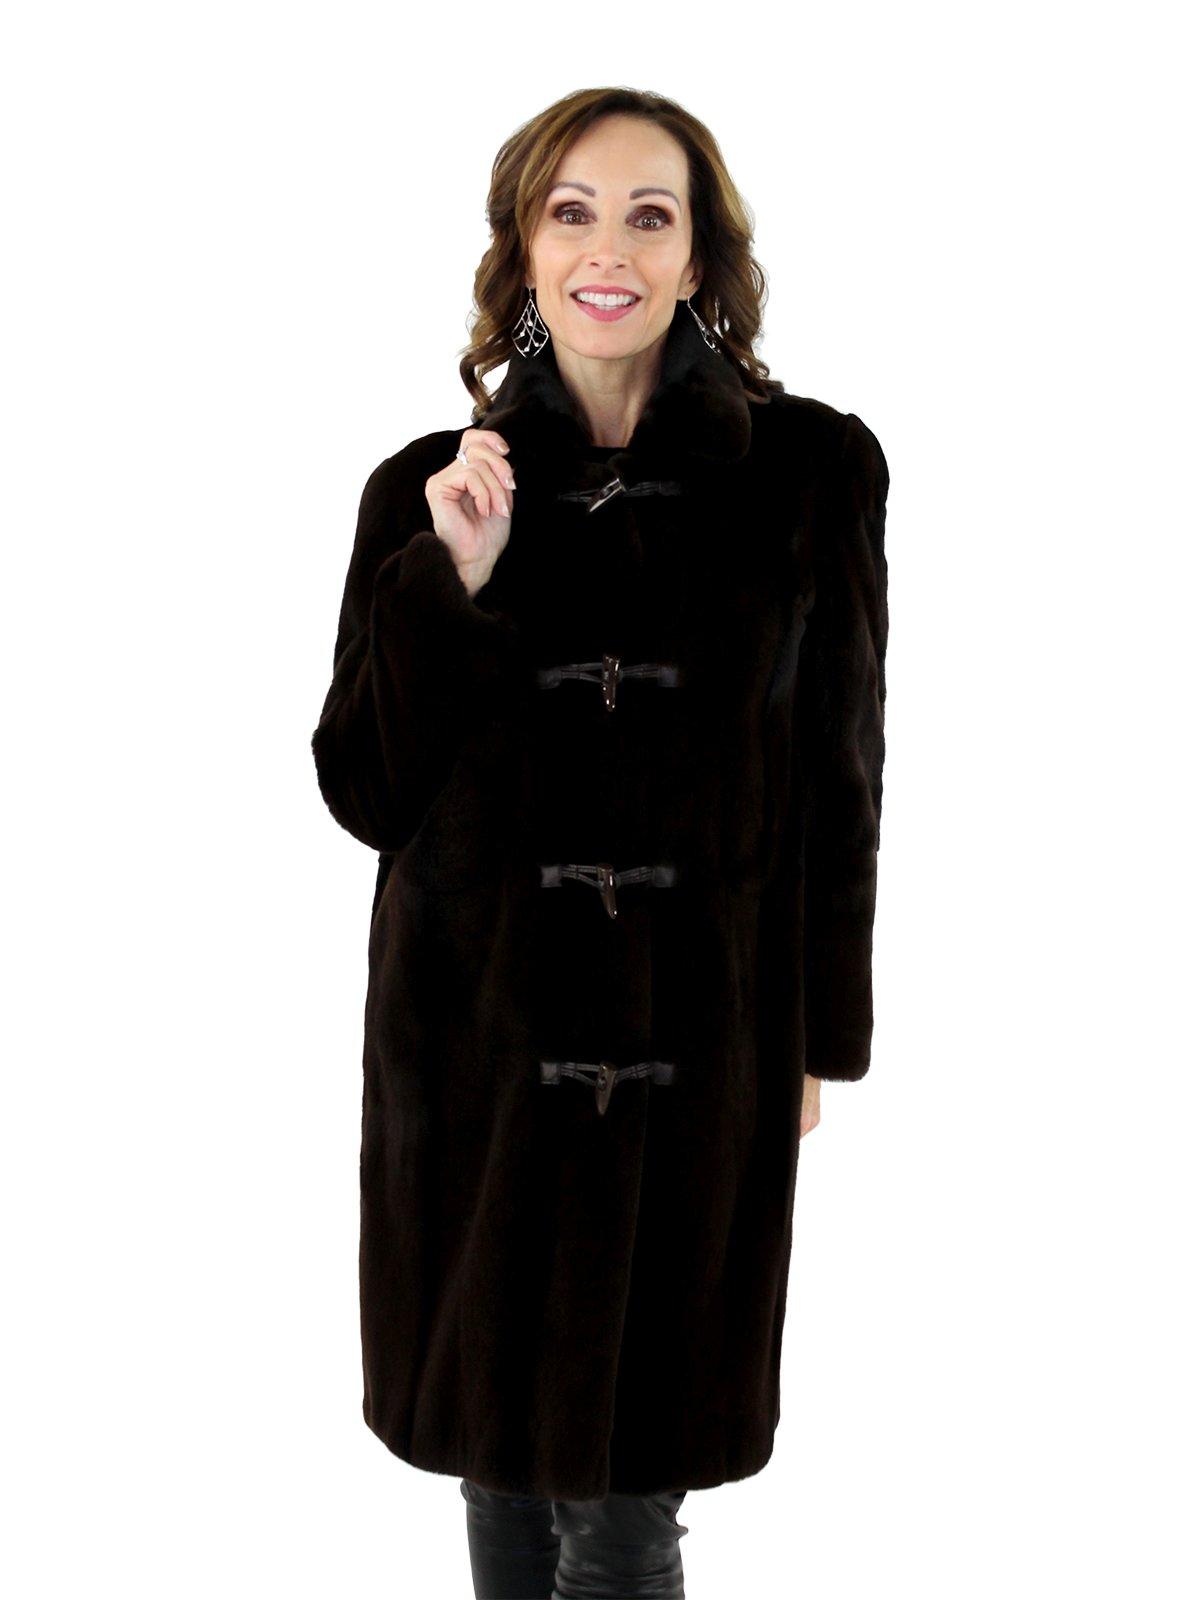 351b43ae5 Brown Sheared Mink Fur Stroller - Women's Mink Stroller - Small ...